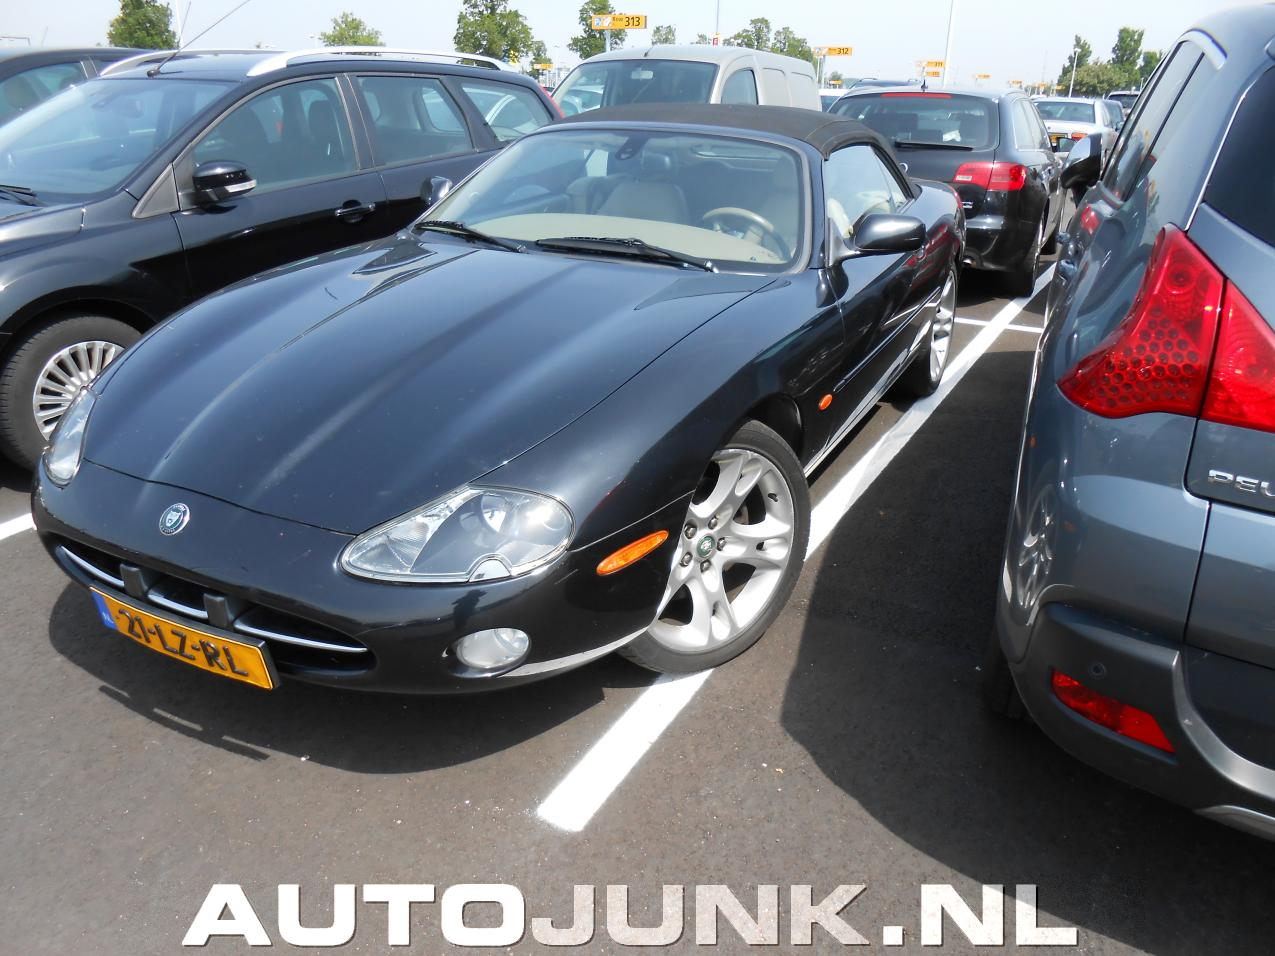 jaguar xk8 cabrio foto 39 s 98647. Black Bedroom Furniture Sets. Home Design Ideas